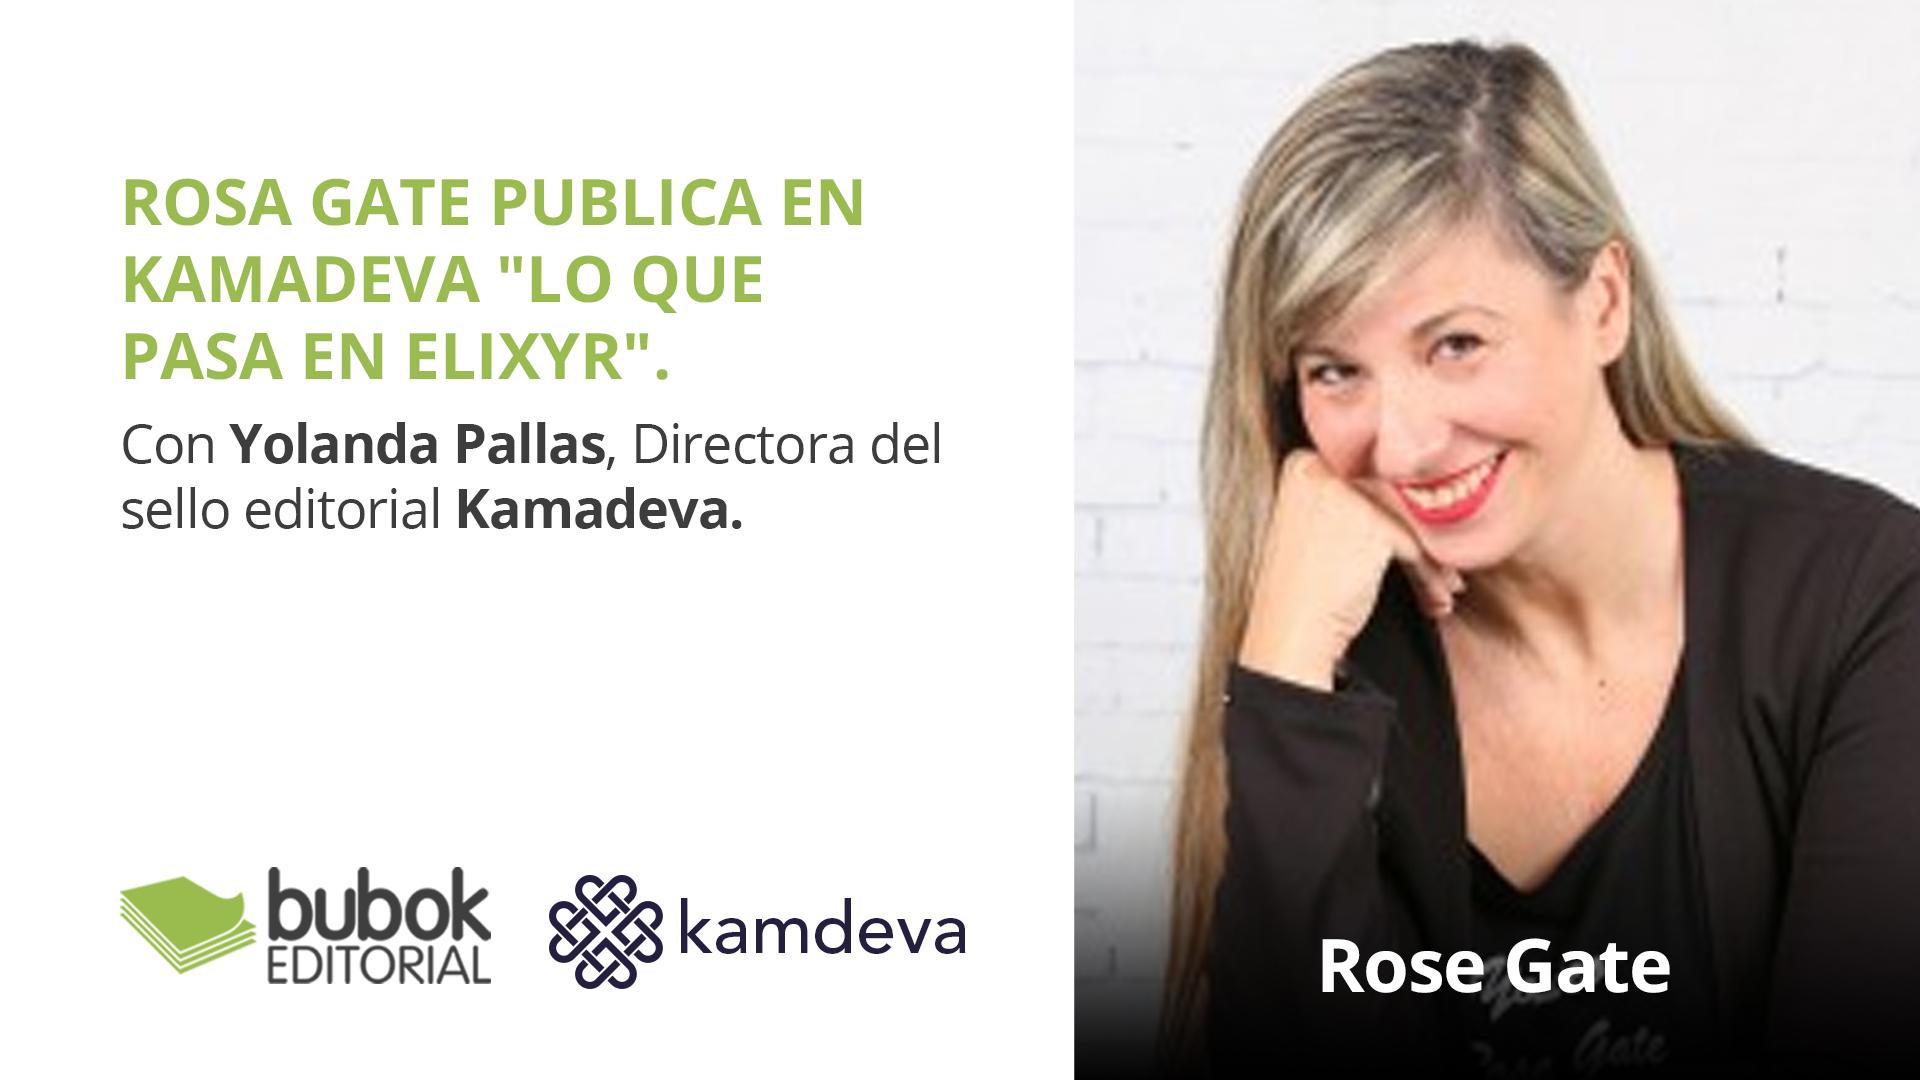 Rosa Gate publica en Kamadeva